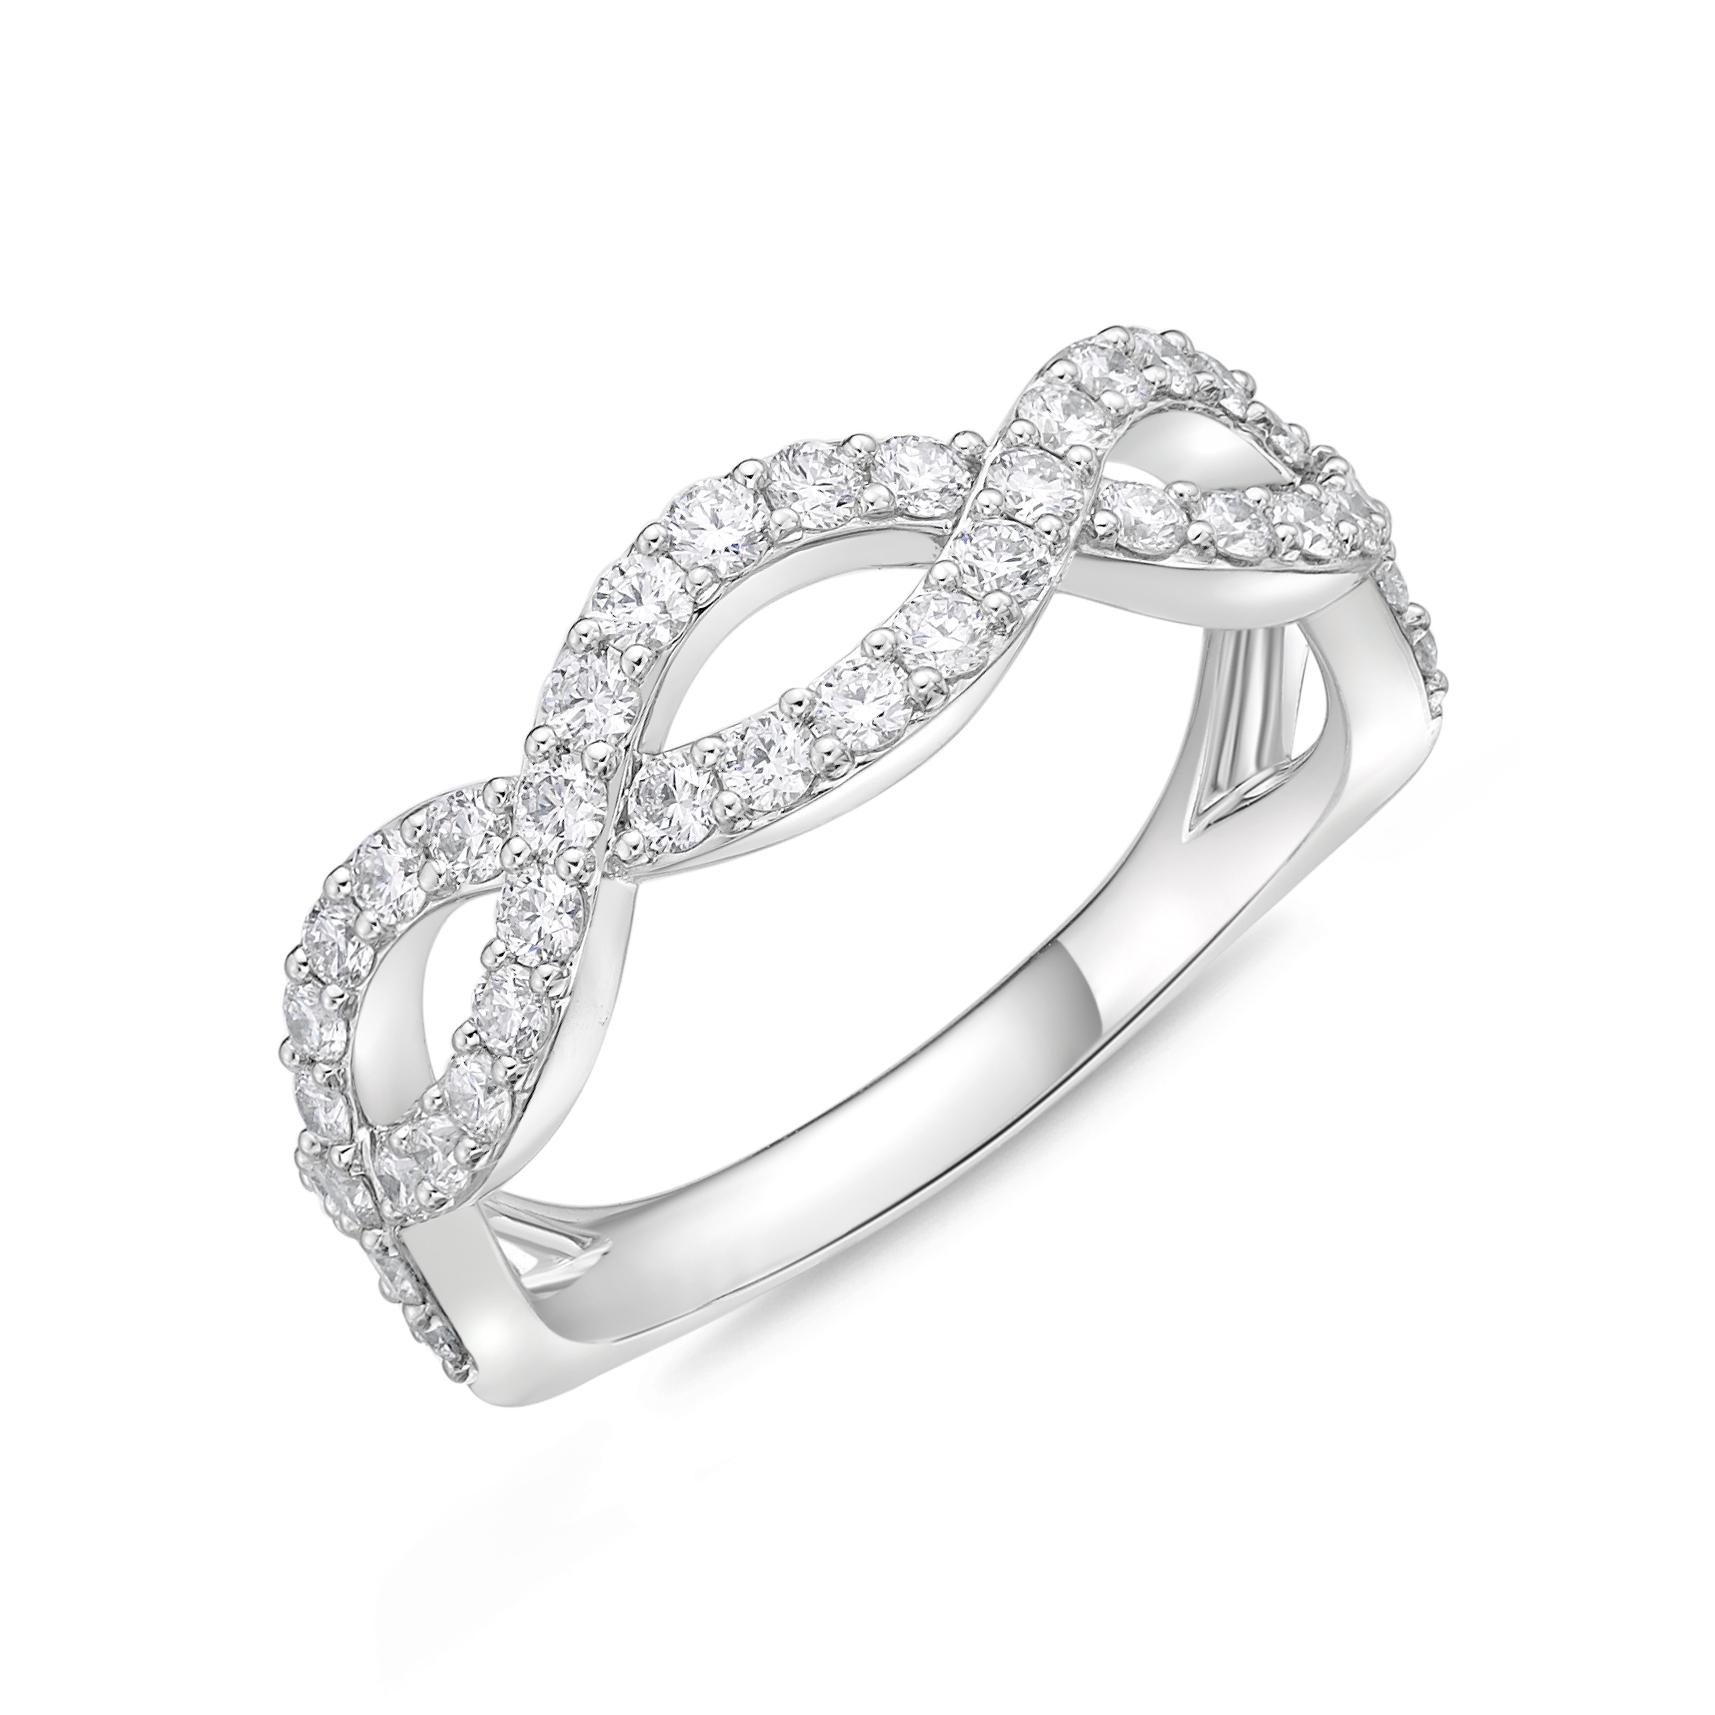 Memoire 18ct White Gold 0.70 Carat Diamond Infinity Ring